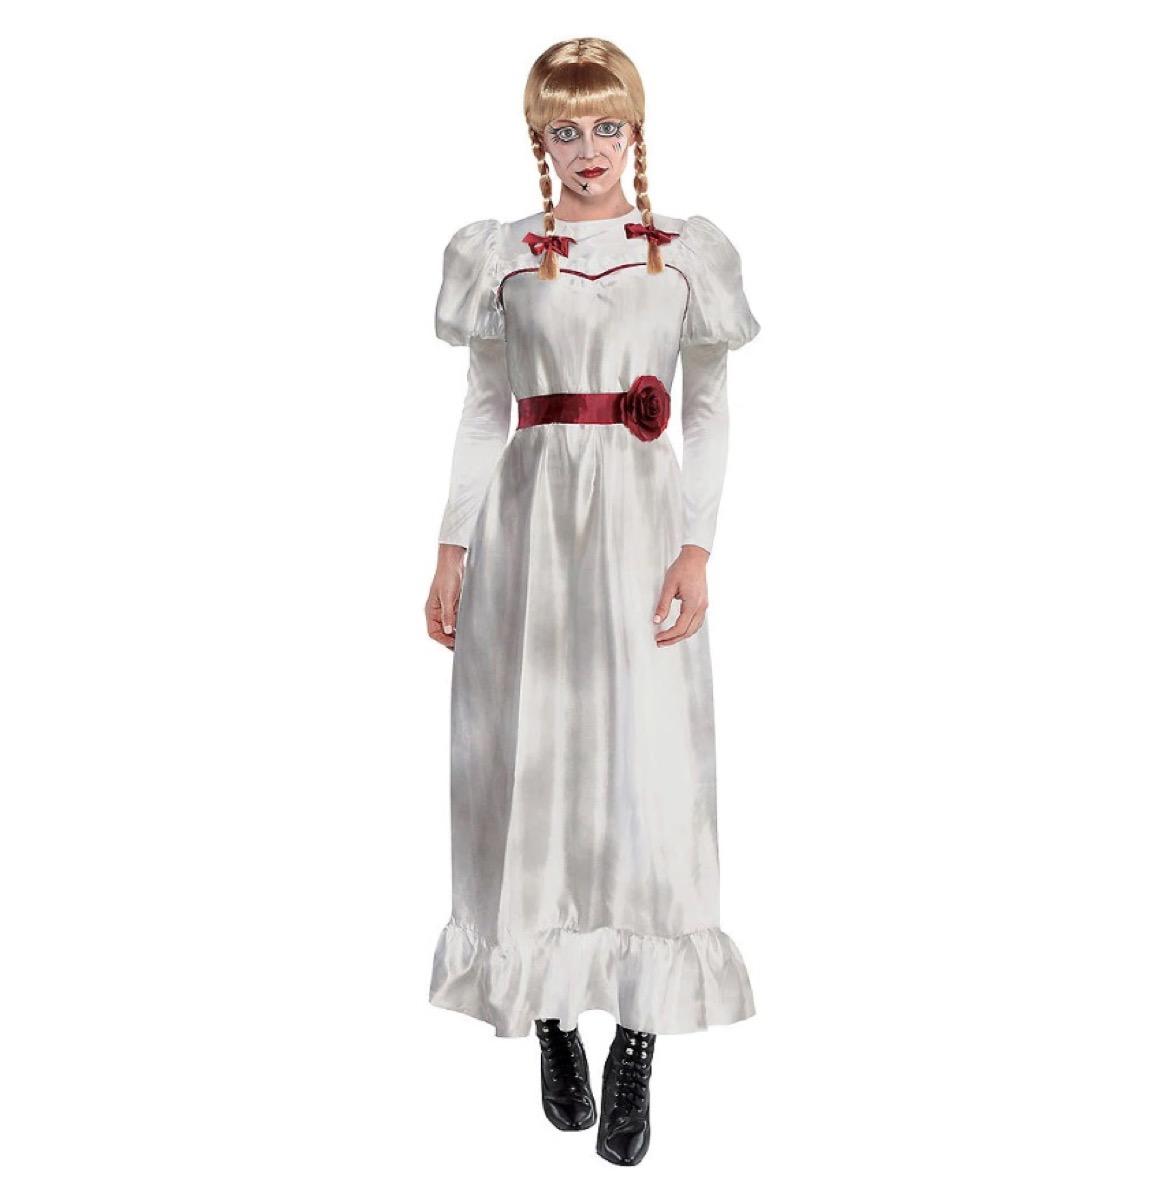 annabelle halloween costumes, best halloween costumes